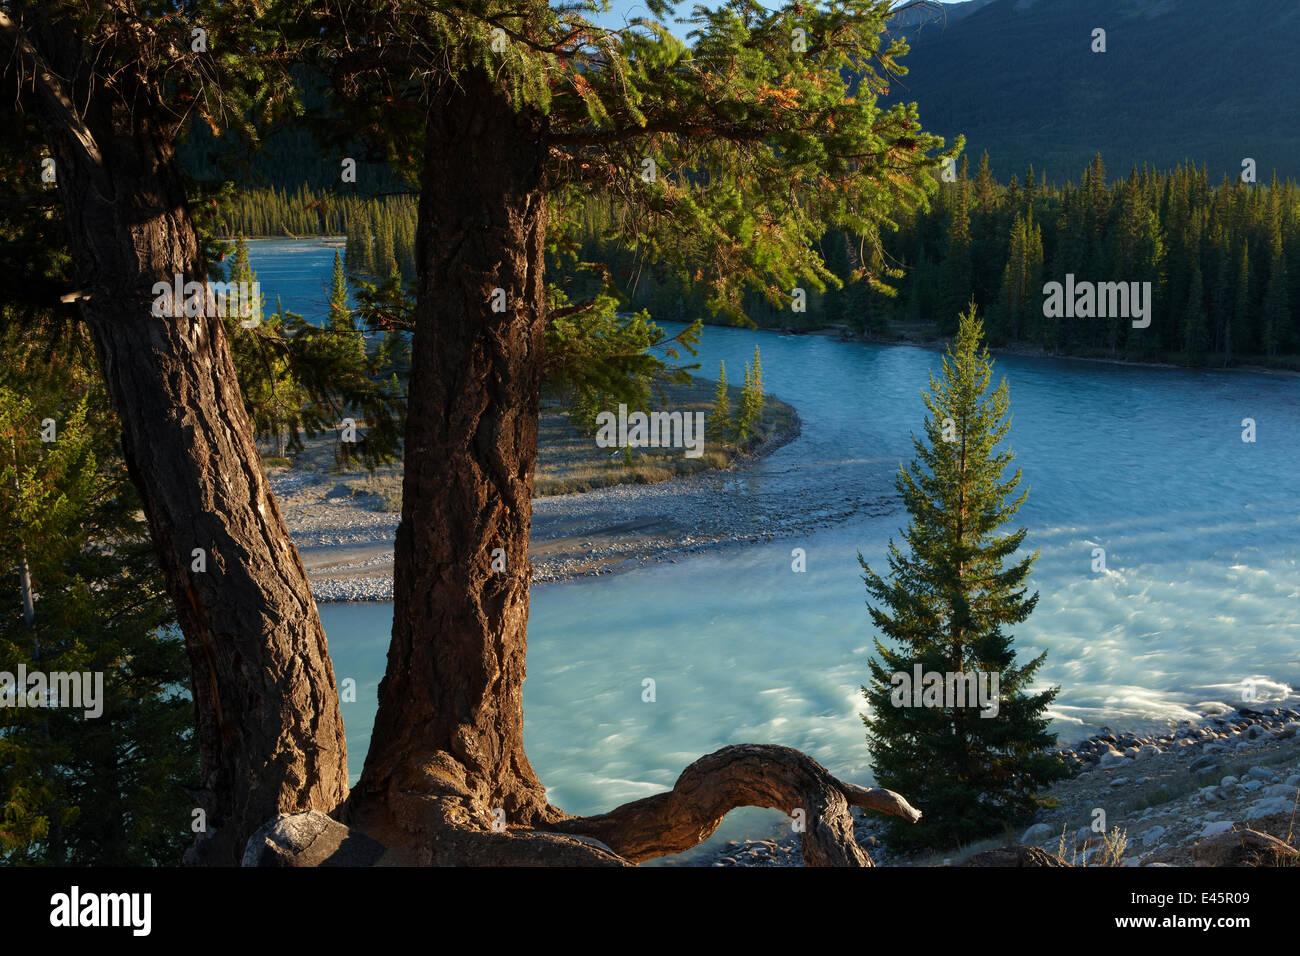 Pine trees by the Athabasca River near Jasper, Jasper National Park, Alberta, Canada. September 2009 - Stock Image